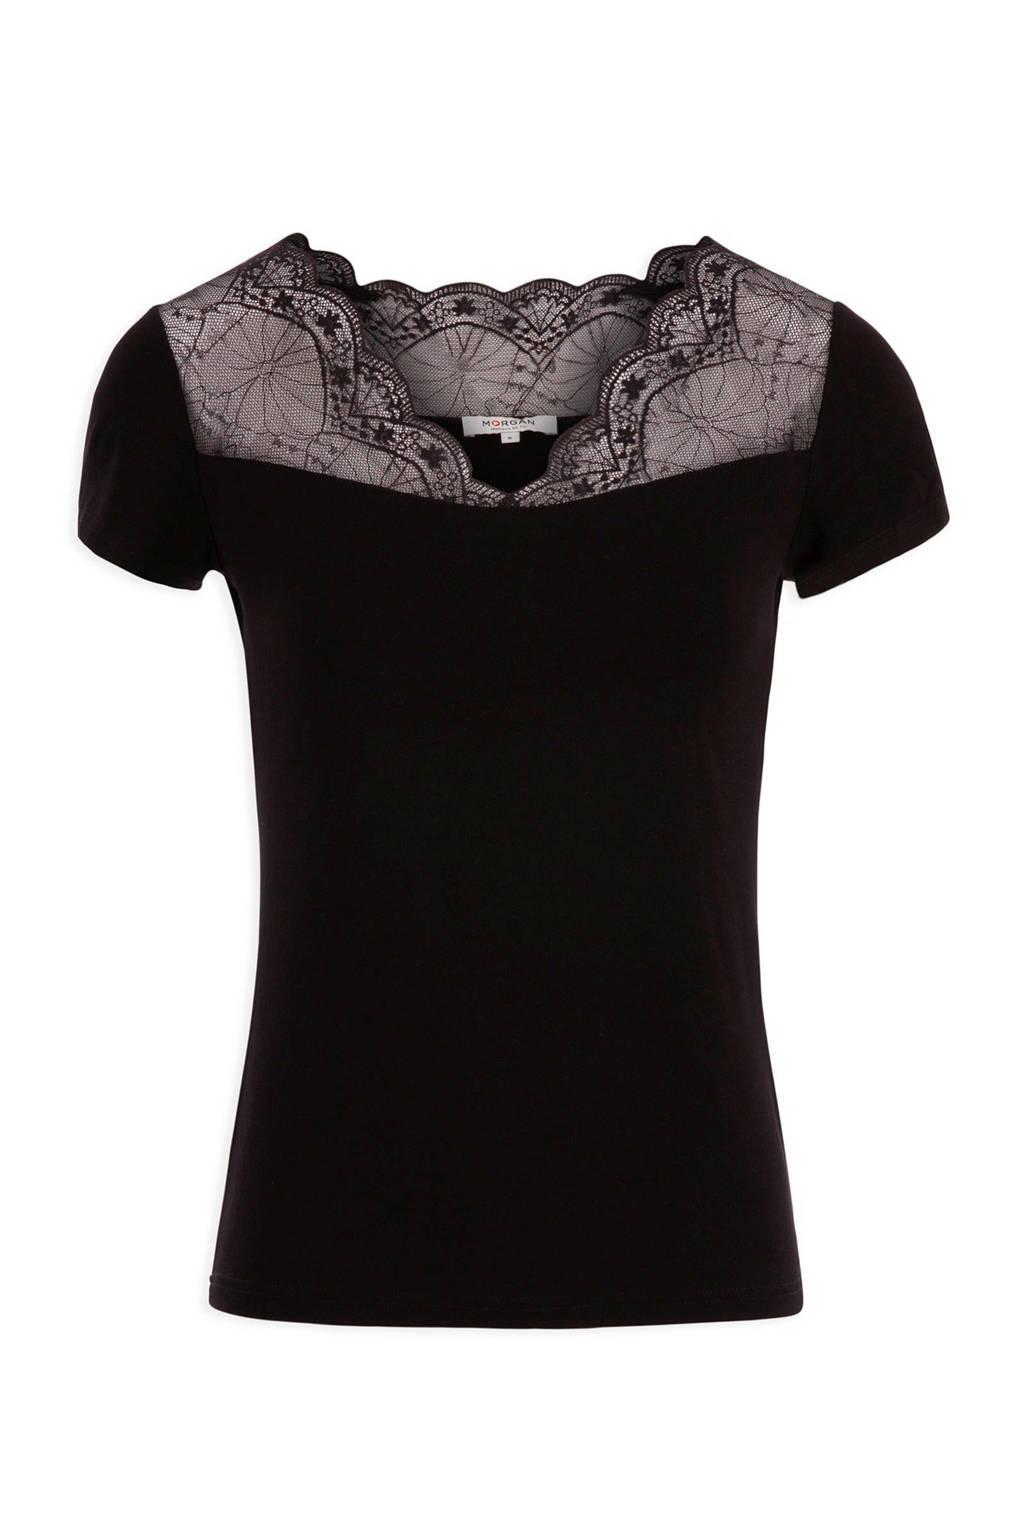 Morgan T-shirt met kant zwart, Zwart